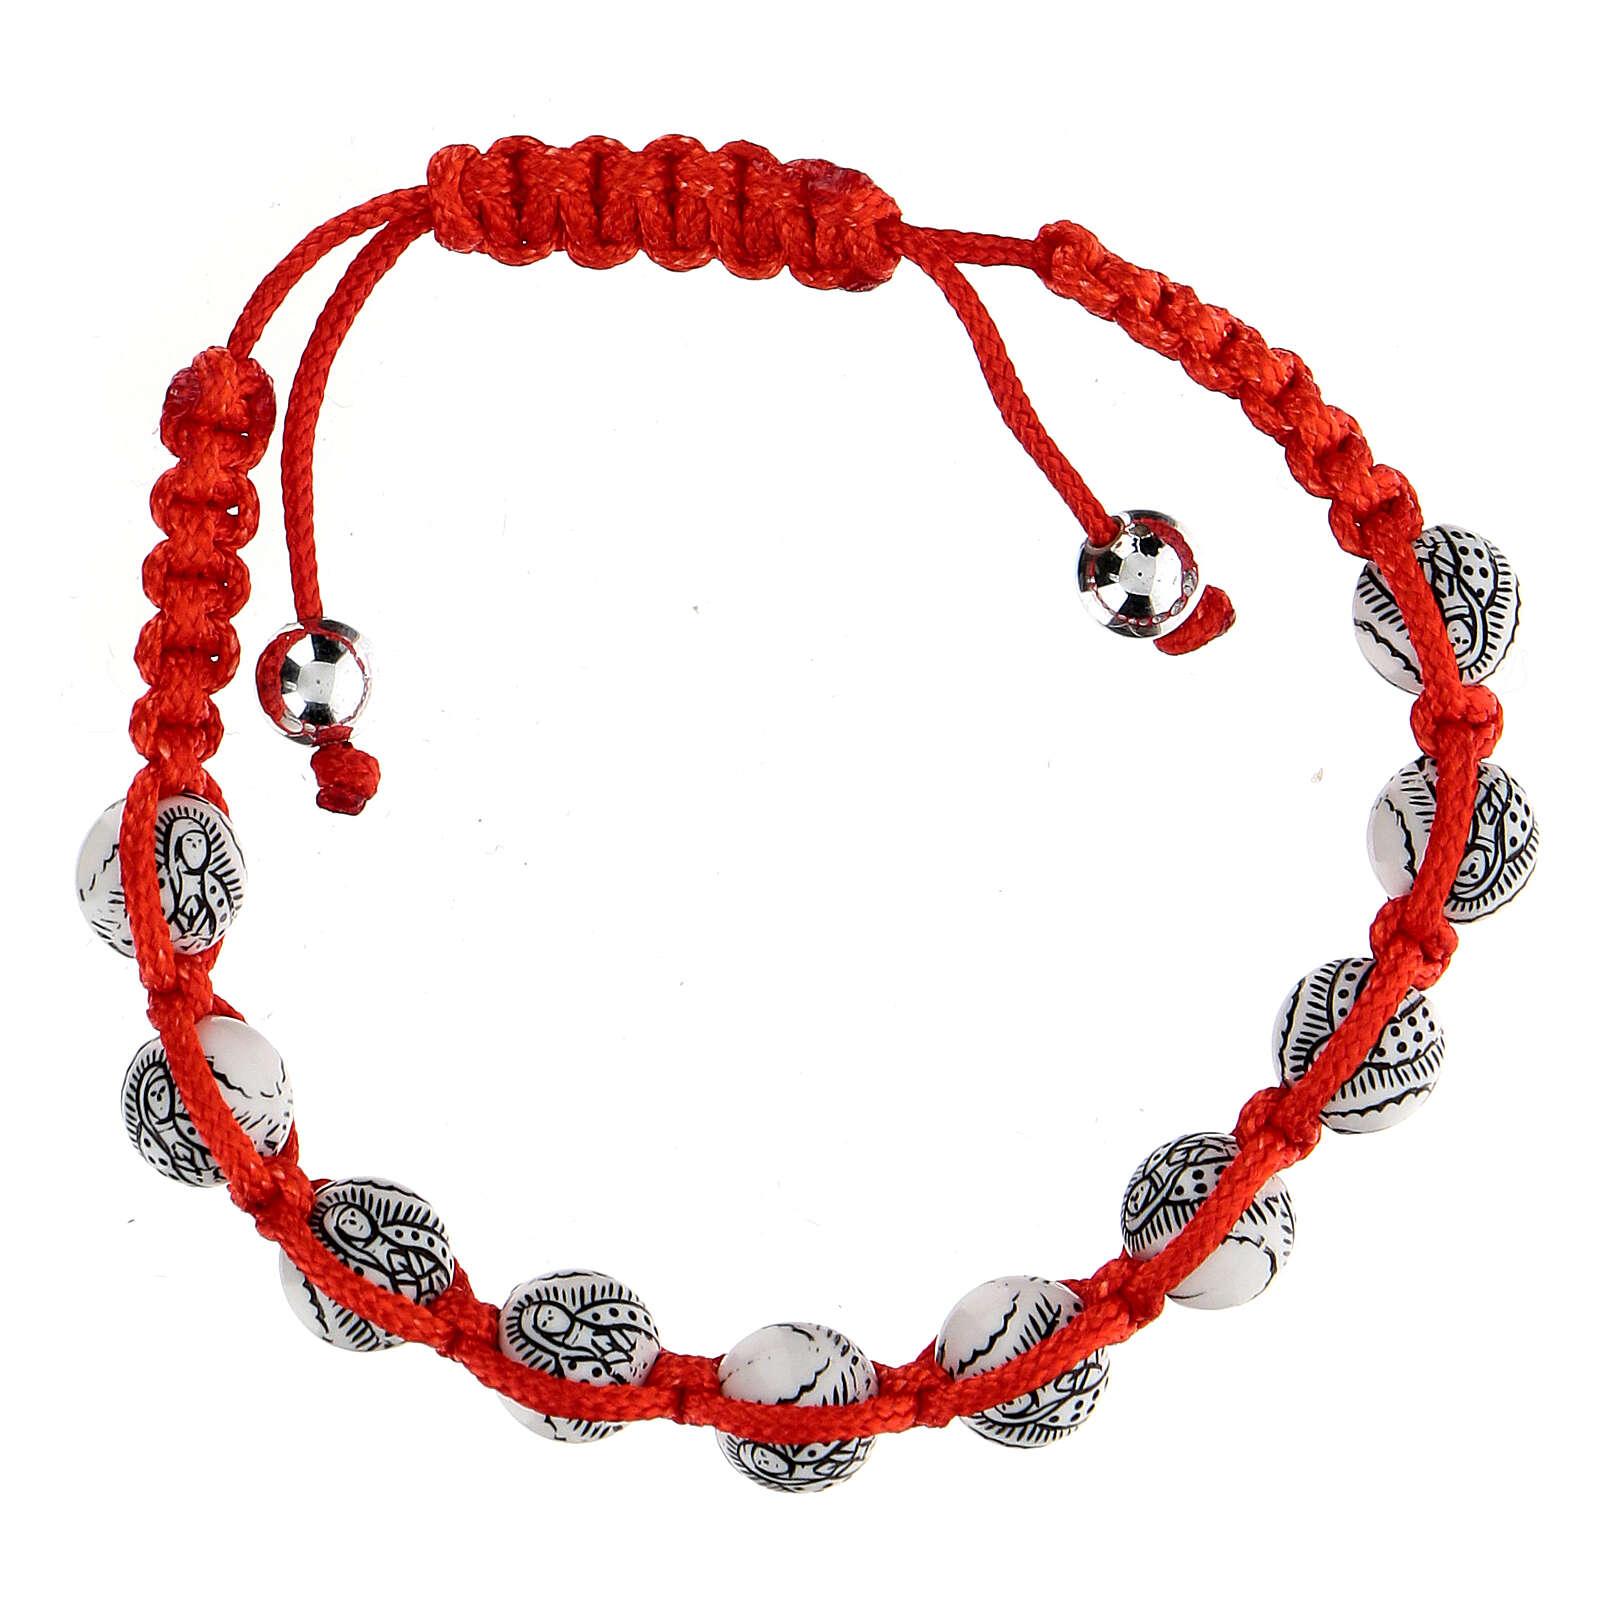 Pulseira dezena Nossa Senhora de Guadalupe corda vermelha 5 mm 4